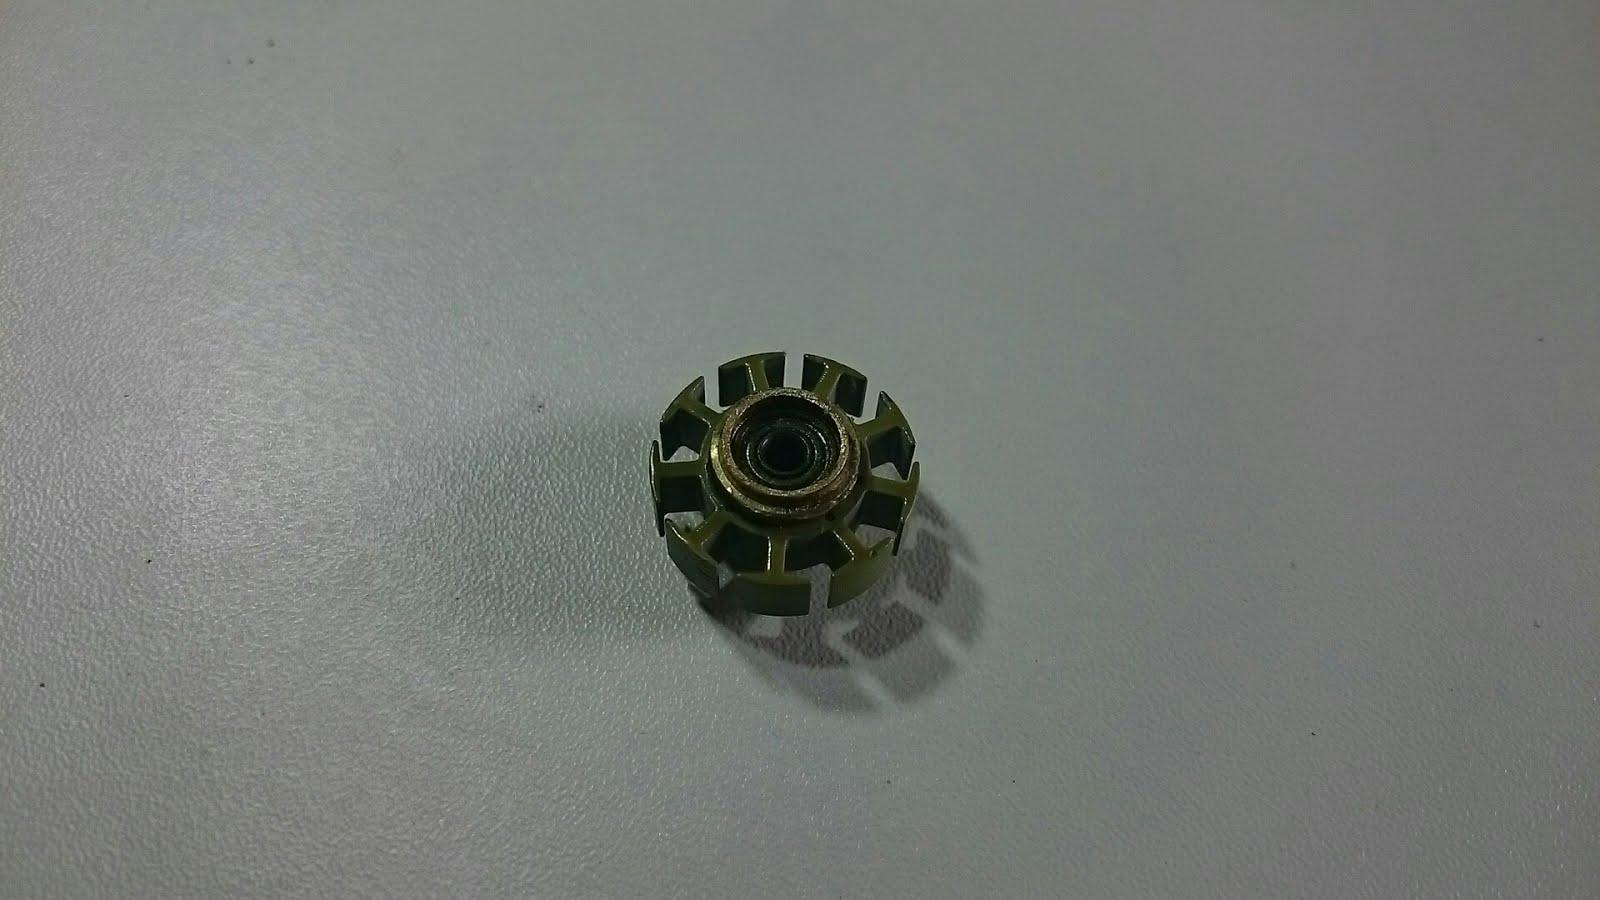 5be792d4047 ... este incrível gerador de pulsos. Este estator tem aproximadamente 20 mm  de diâmetro